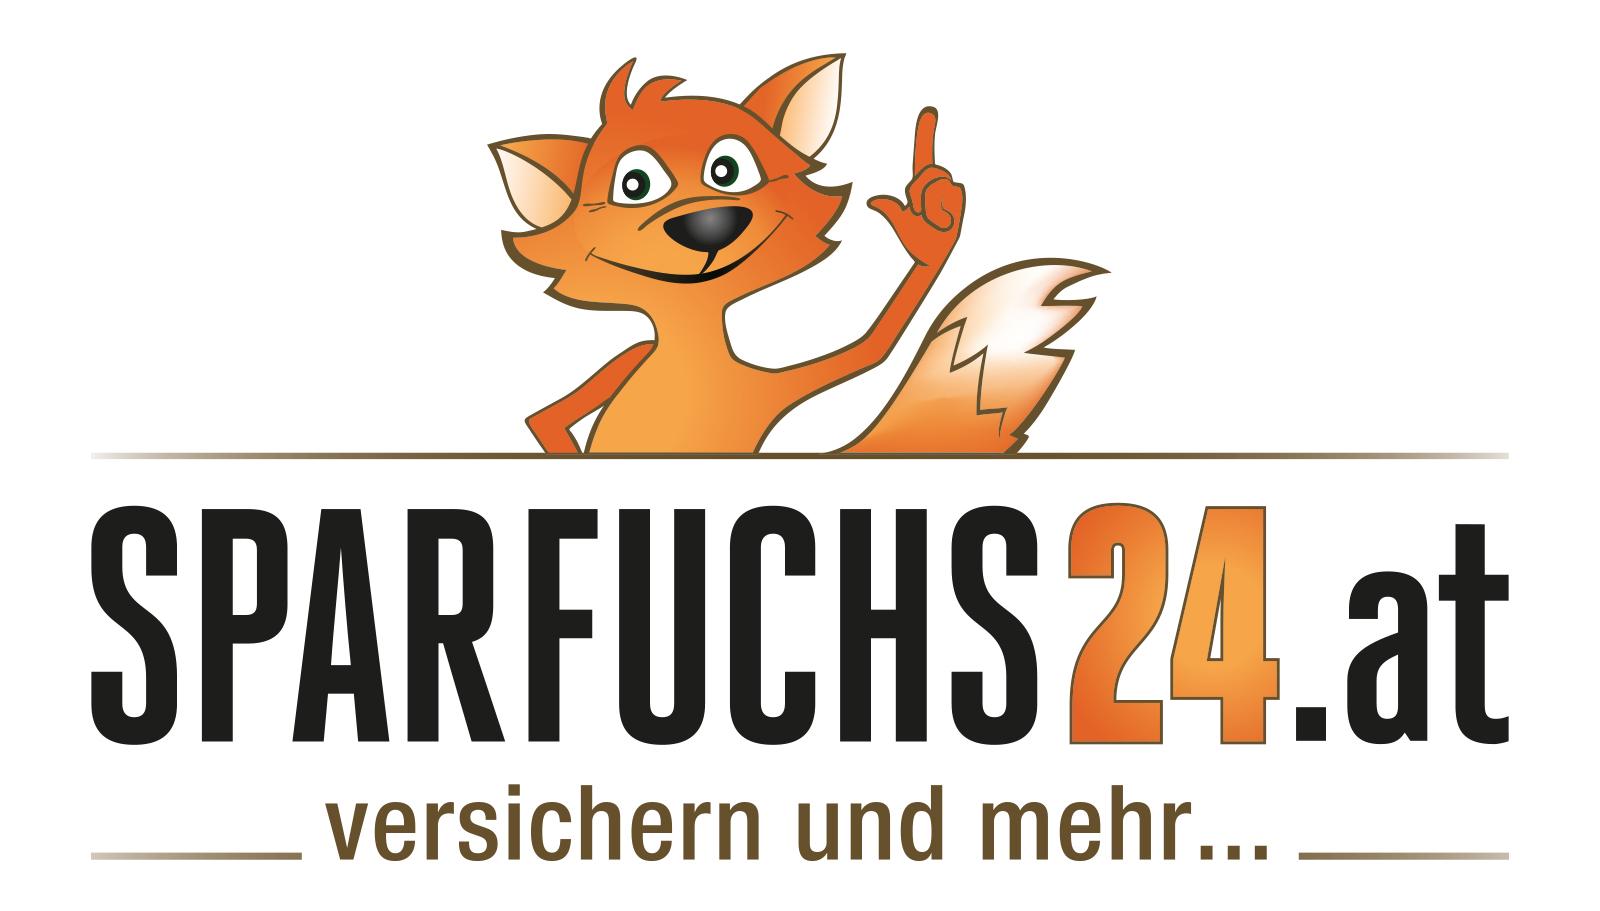 Sparfuchs_rz